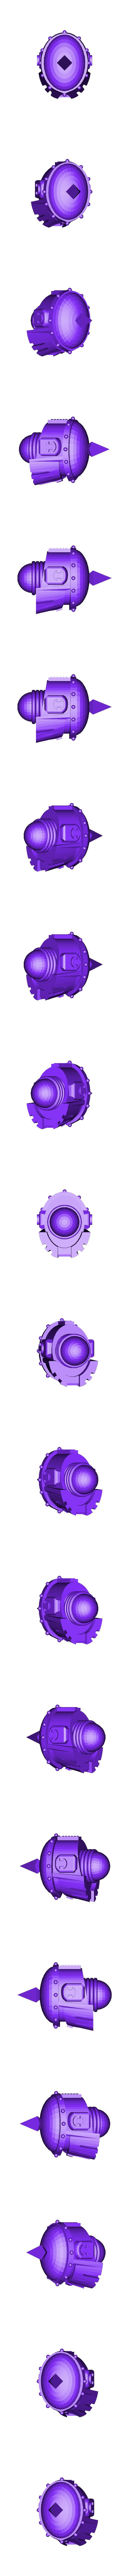 mk3-helmet.stl Download free STL file Death Guard MK3 Helmet • 3D printer template, DimensionV